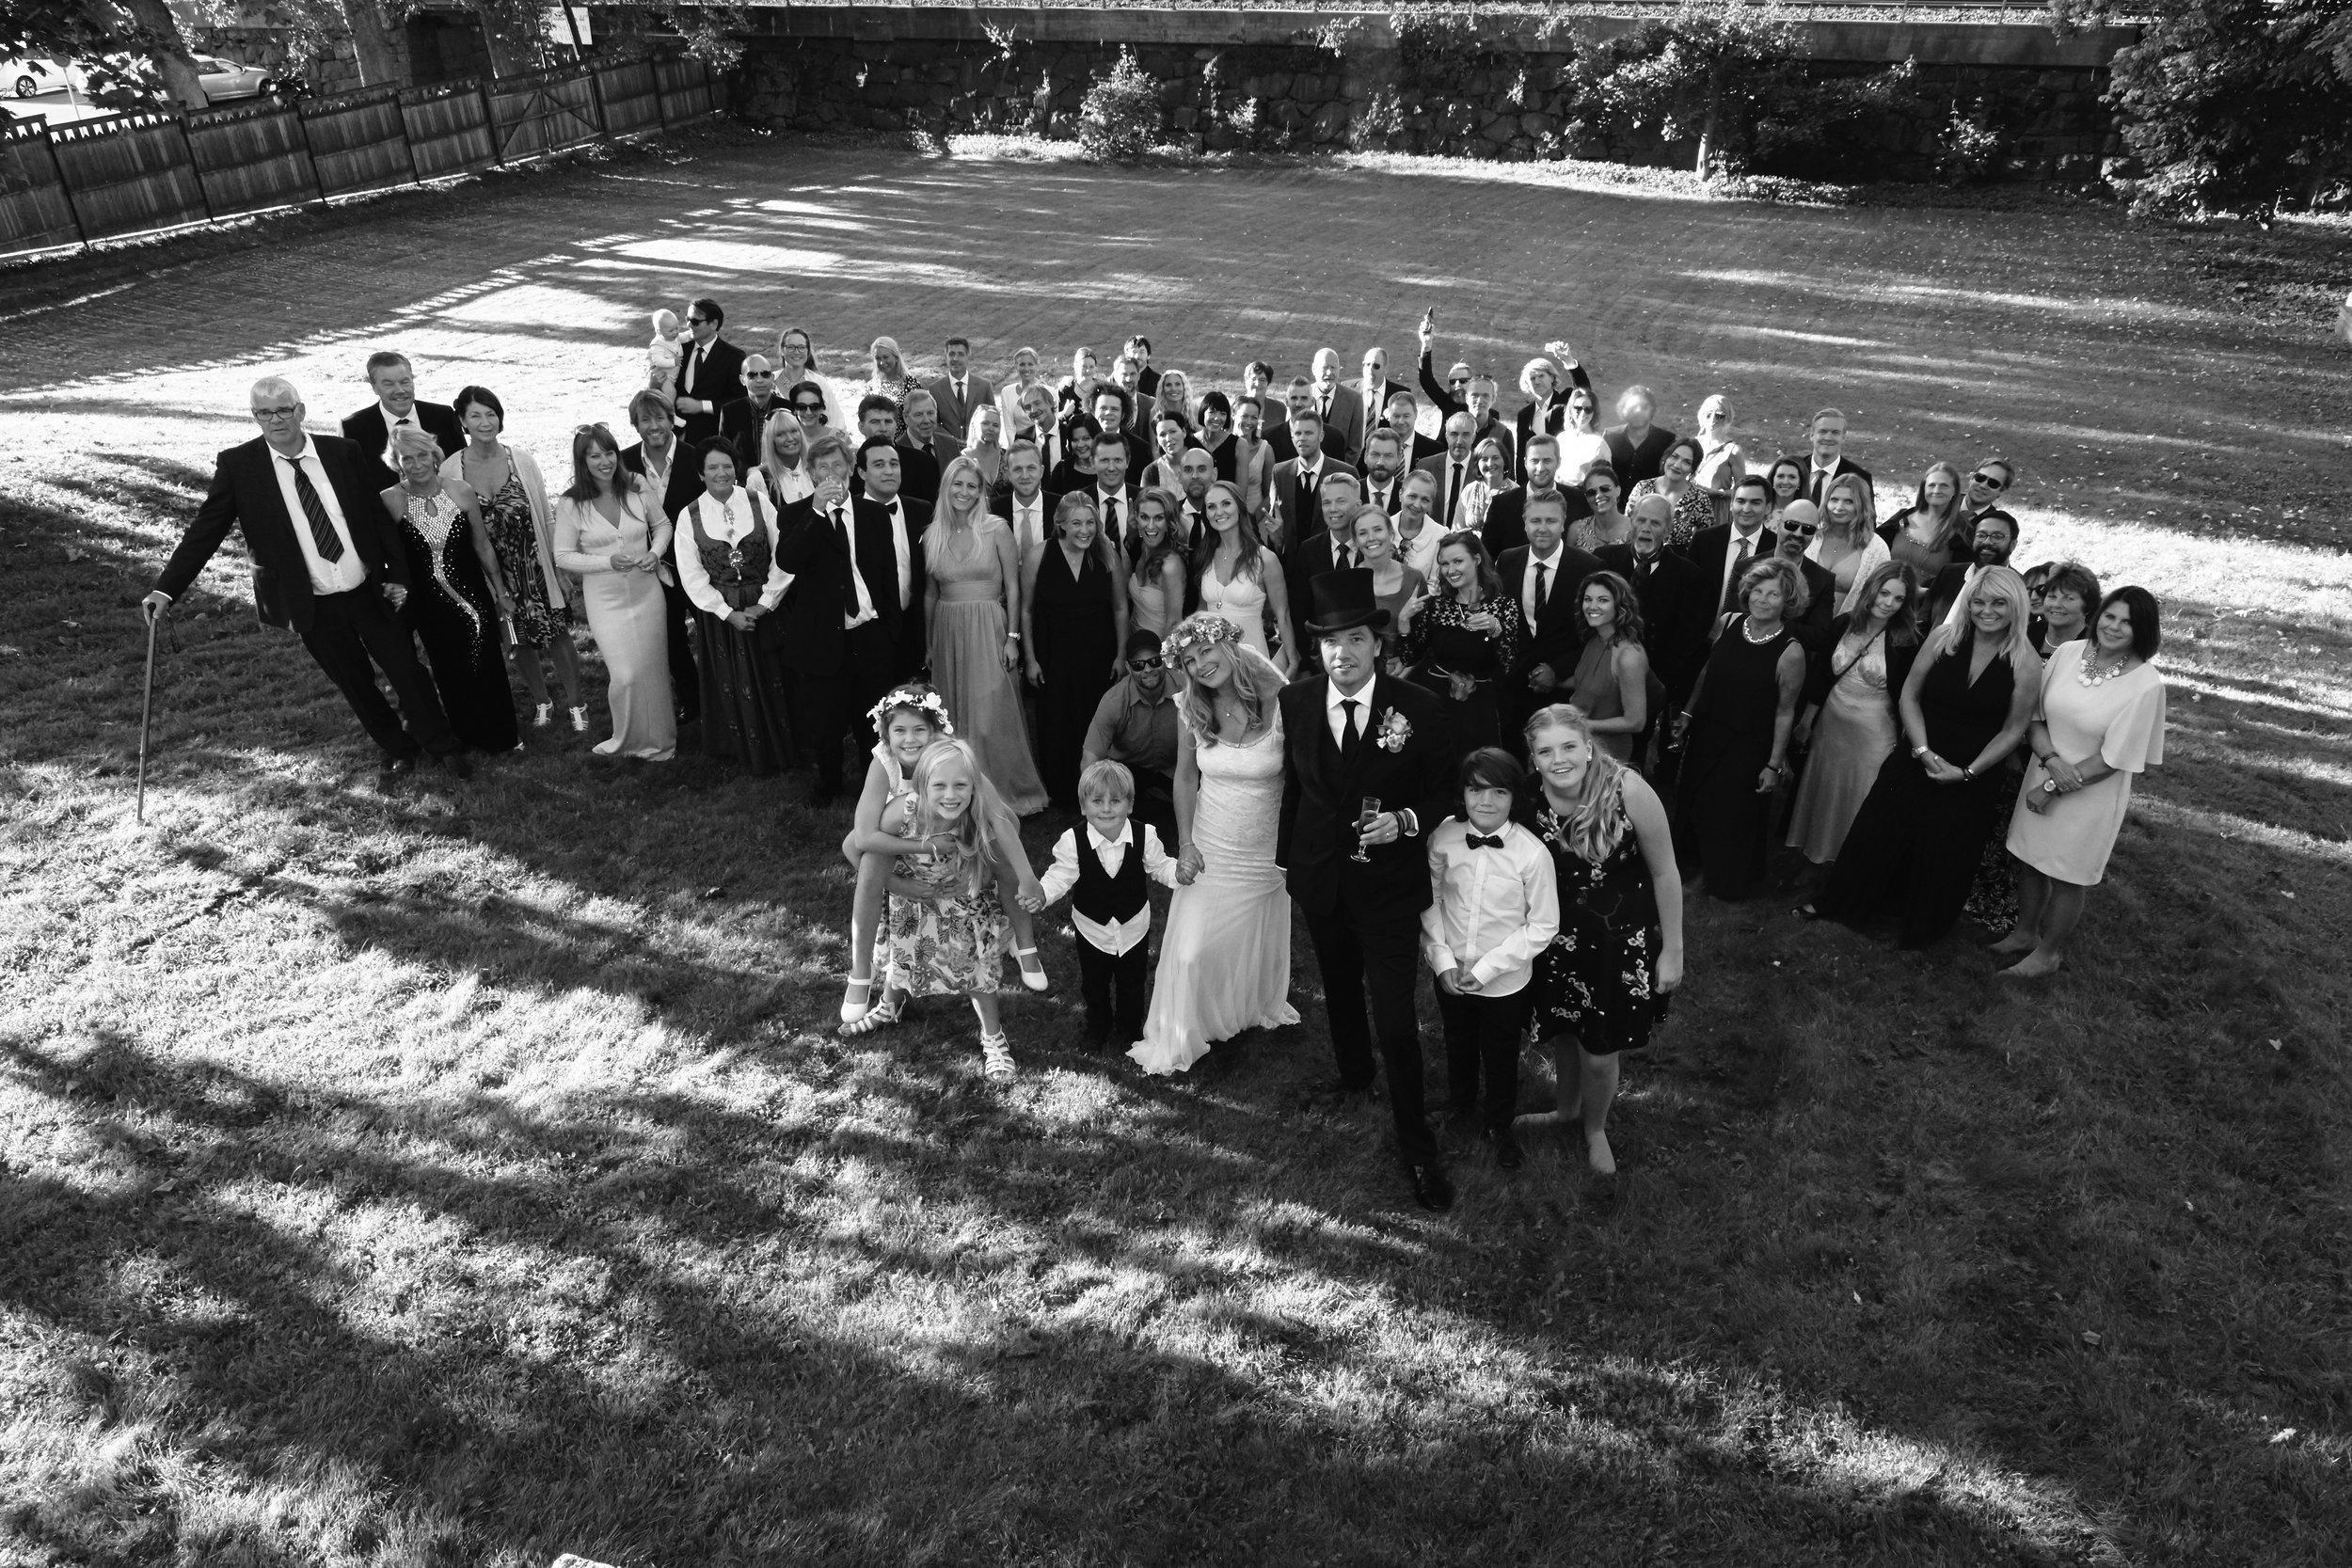 lone bryllup 333.jpg